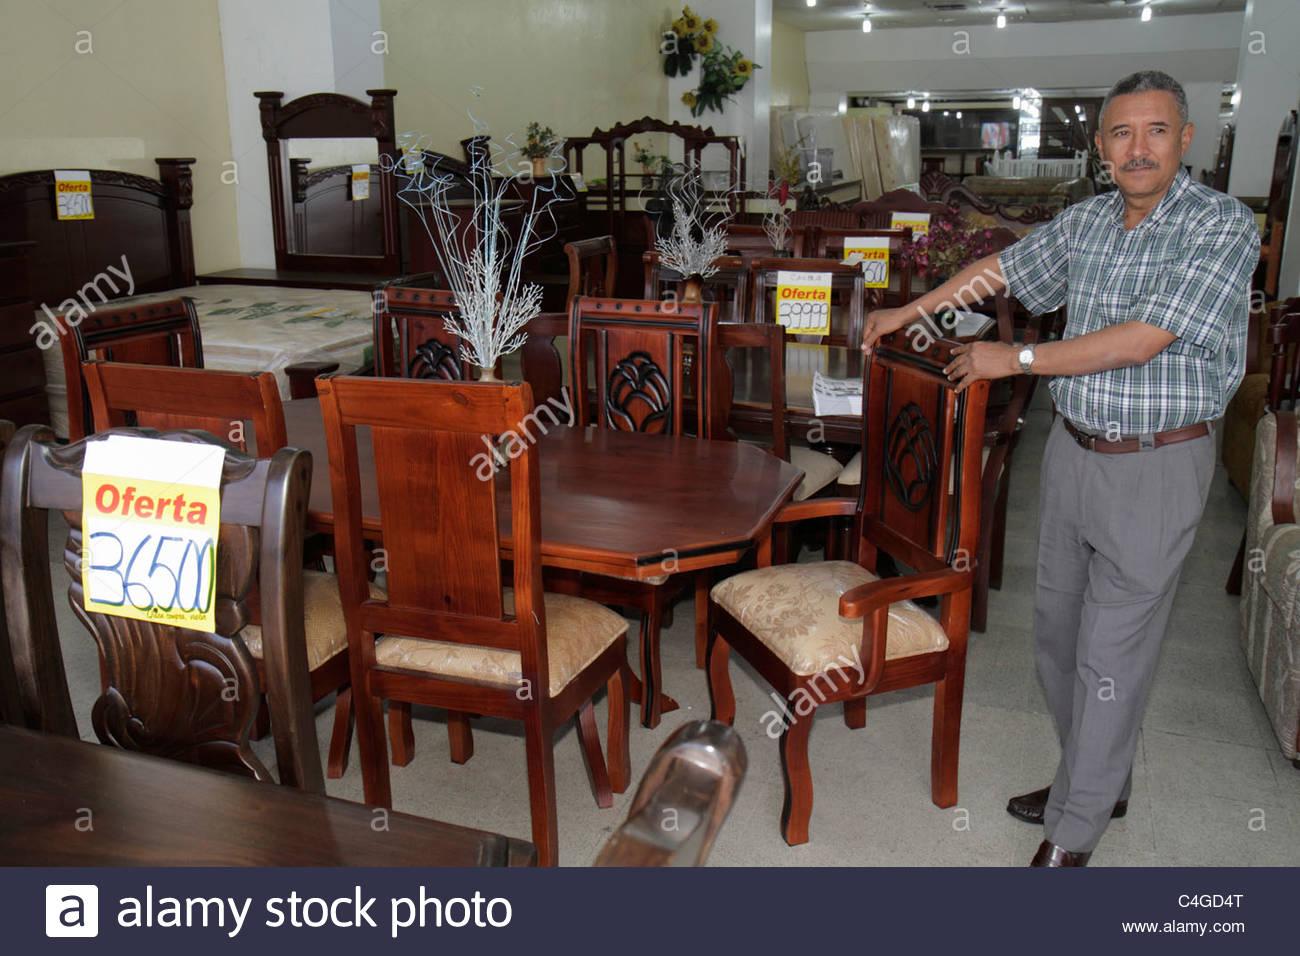 Awesome Santo Domingo Dominican Republic Ciudad Colonia Mercado Modela Market  Furniture Store Business Dining Room Set Suite Table Chair